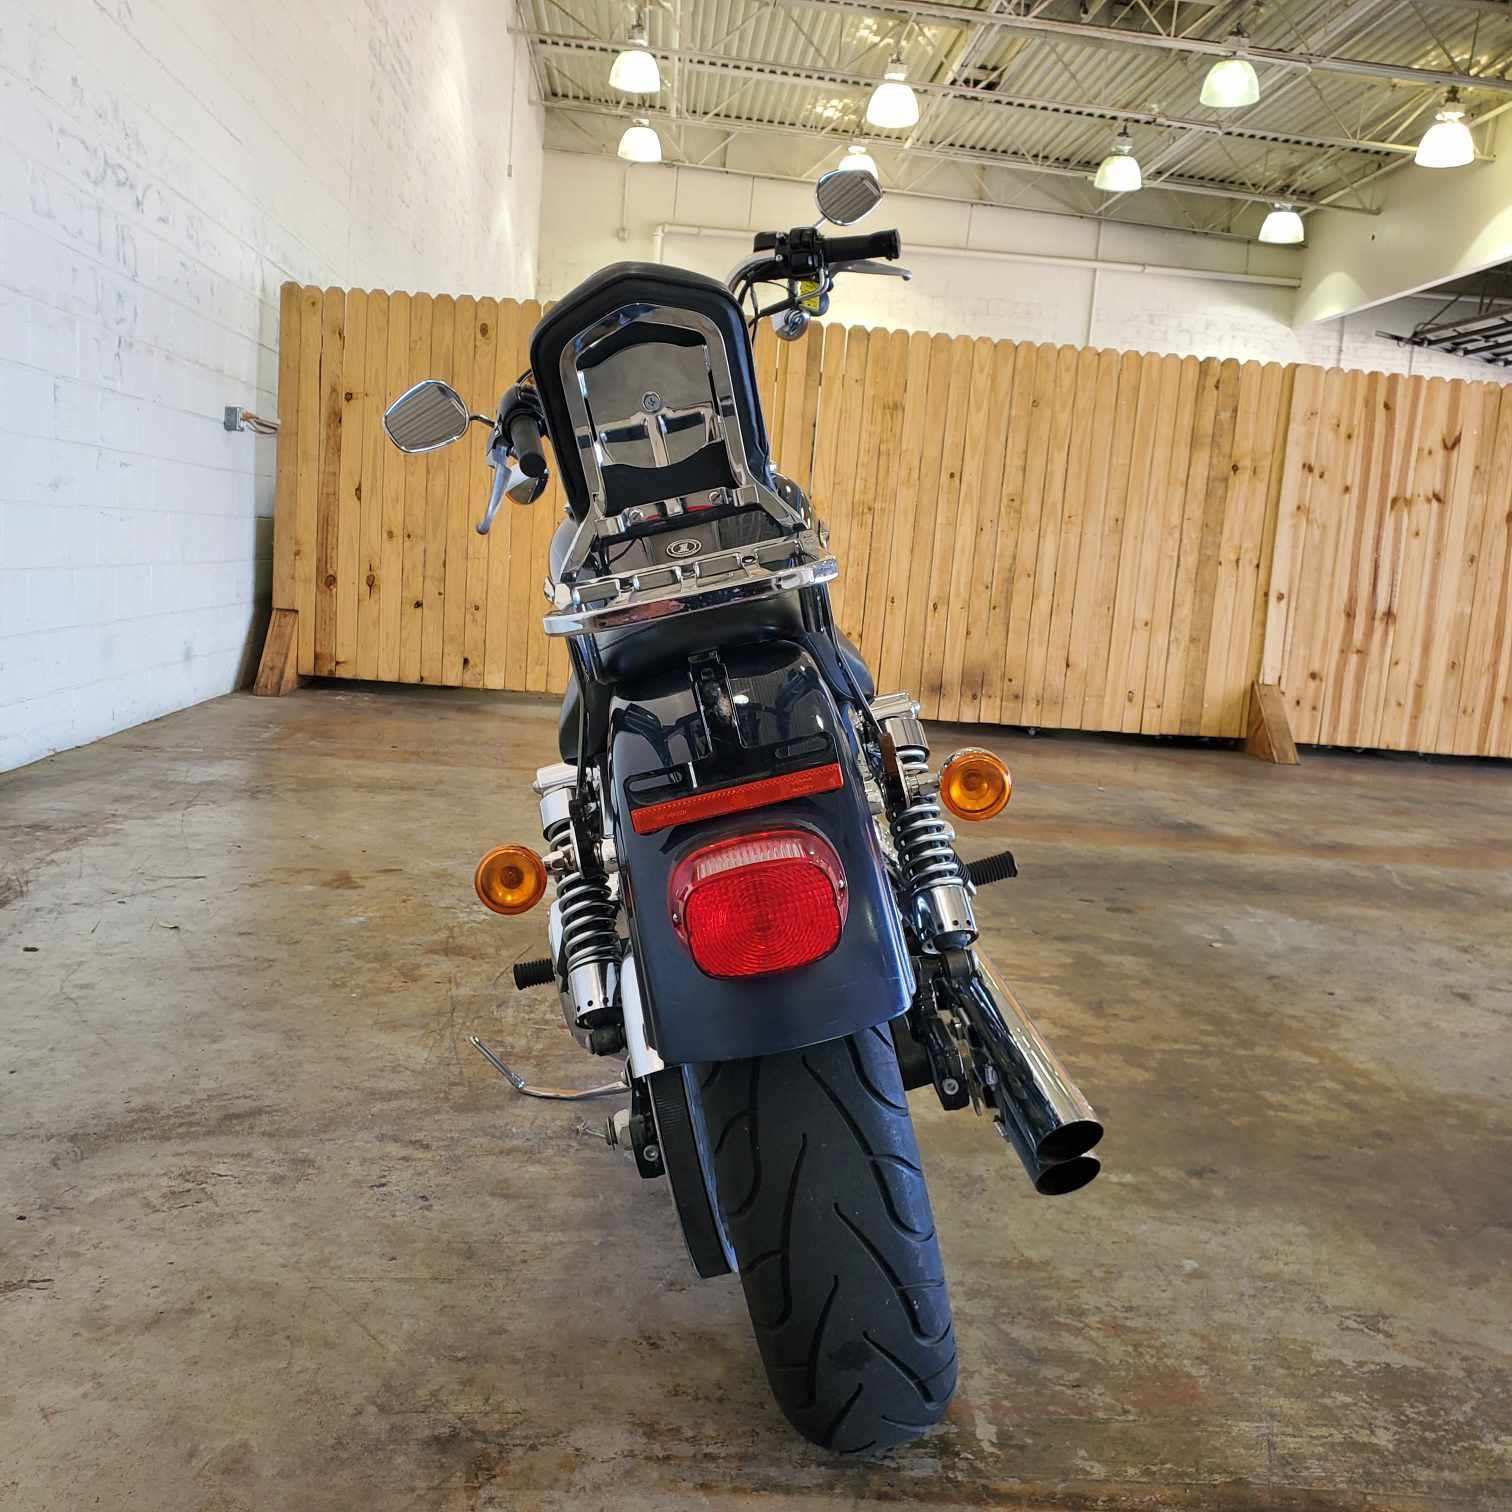 2008 Harley-Davidson Dyna Glide Super Glide Custom at Twisted Cycles